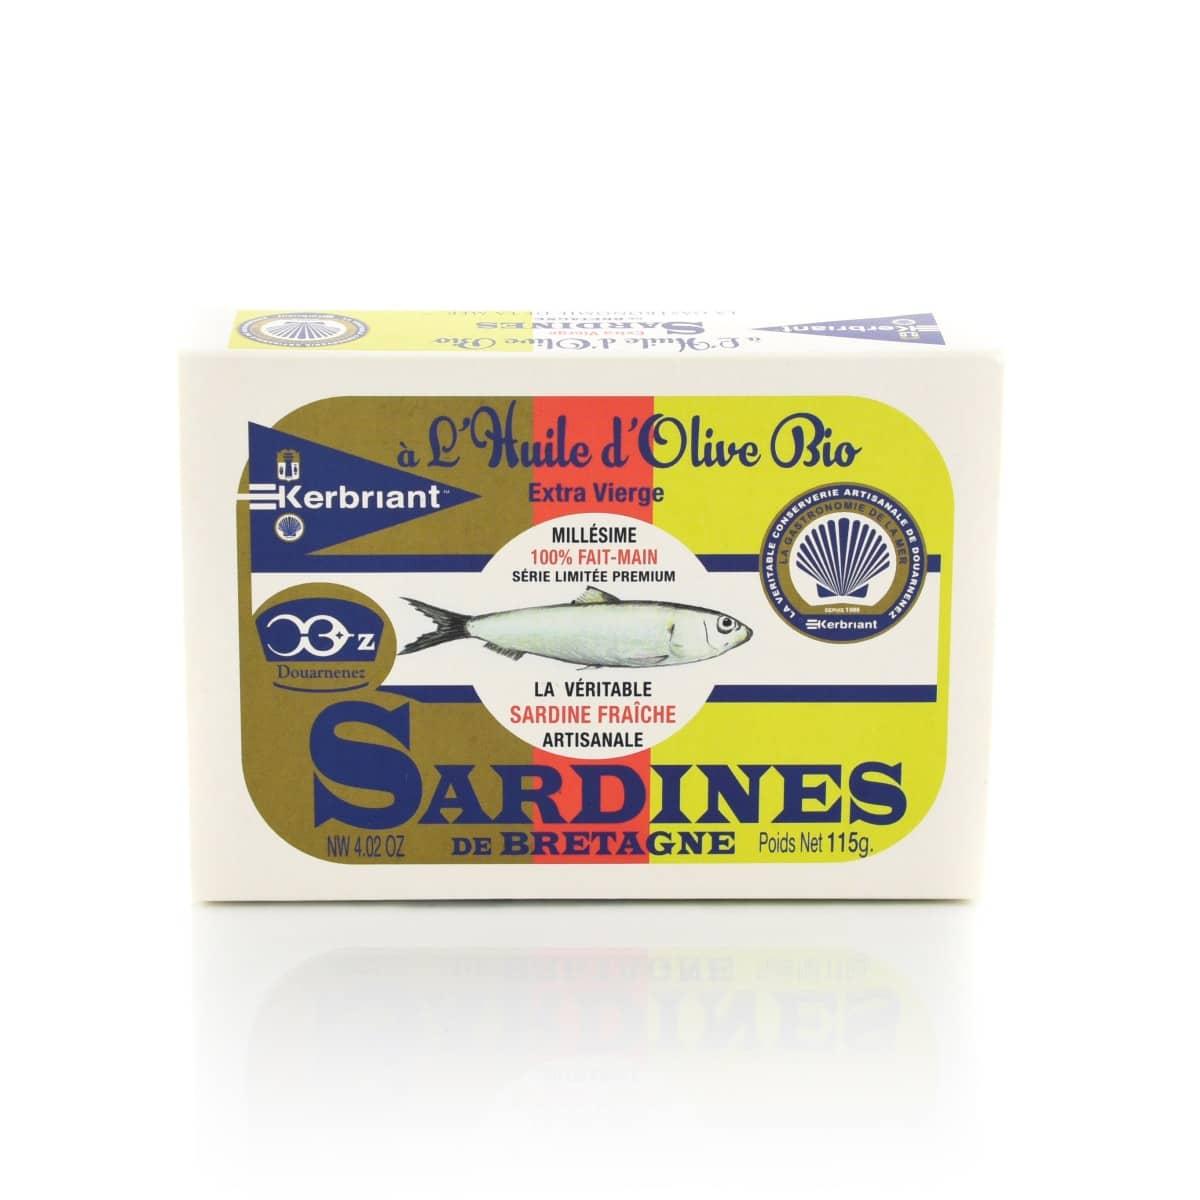 https://www.kerbriant.fr/wp-content/uploads/2012/02/Sardines_Huile_Olive_Bio_ExtraVierge_Kerbriant.jpg